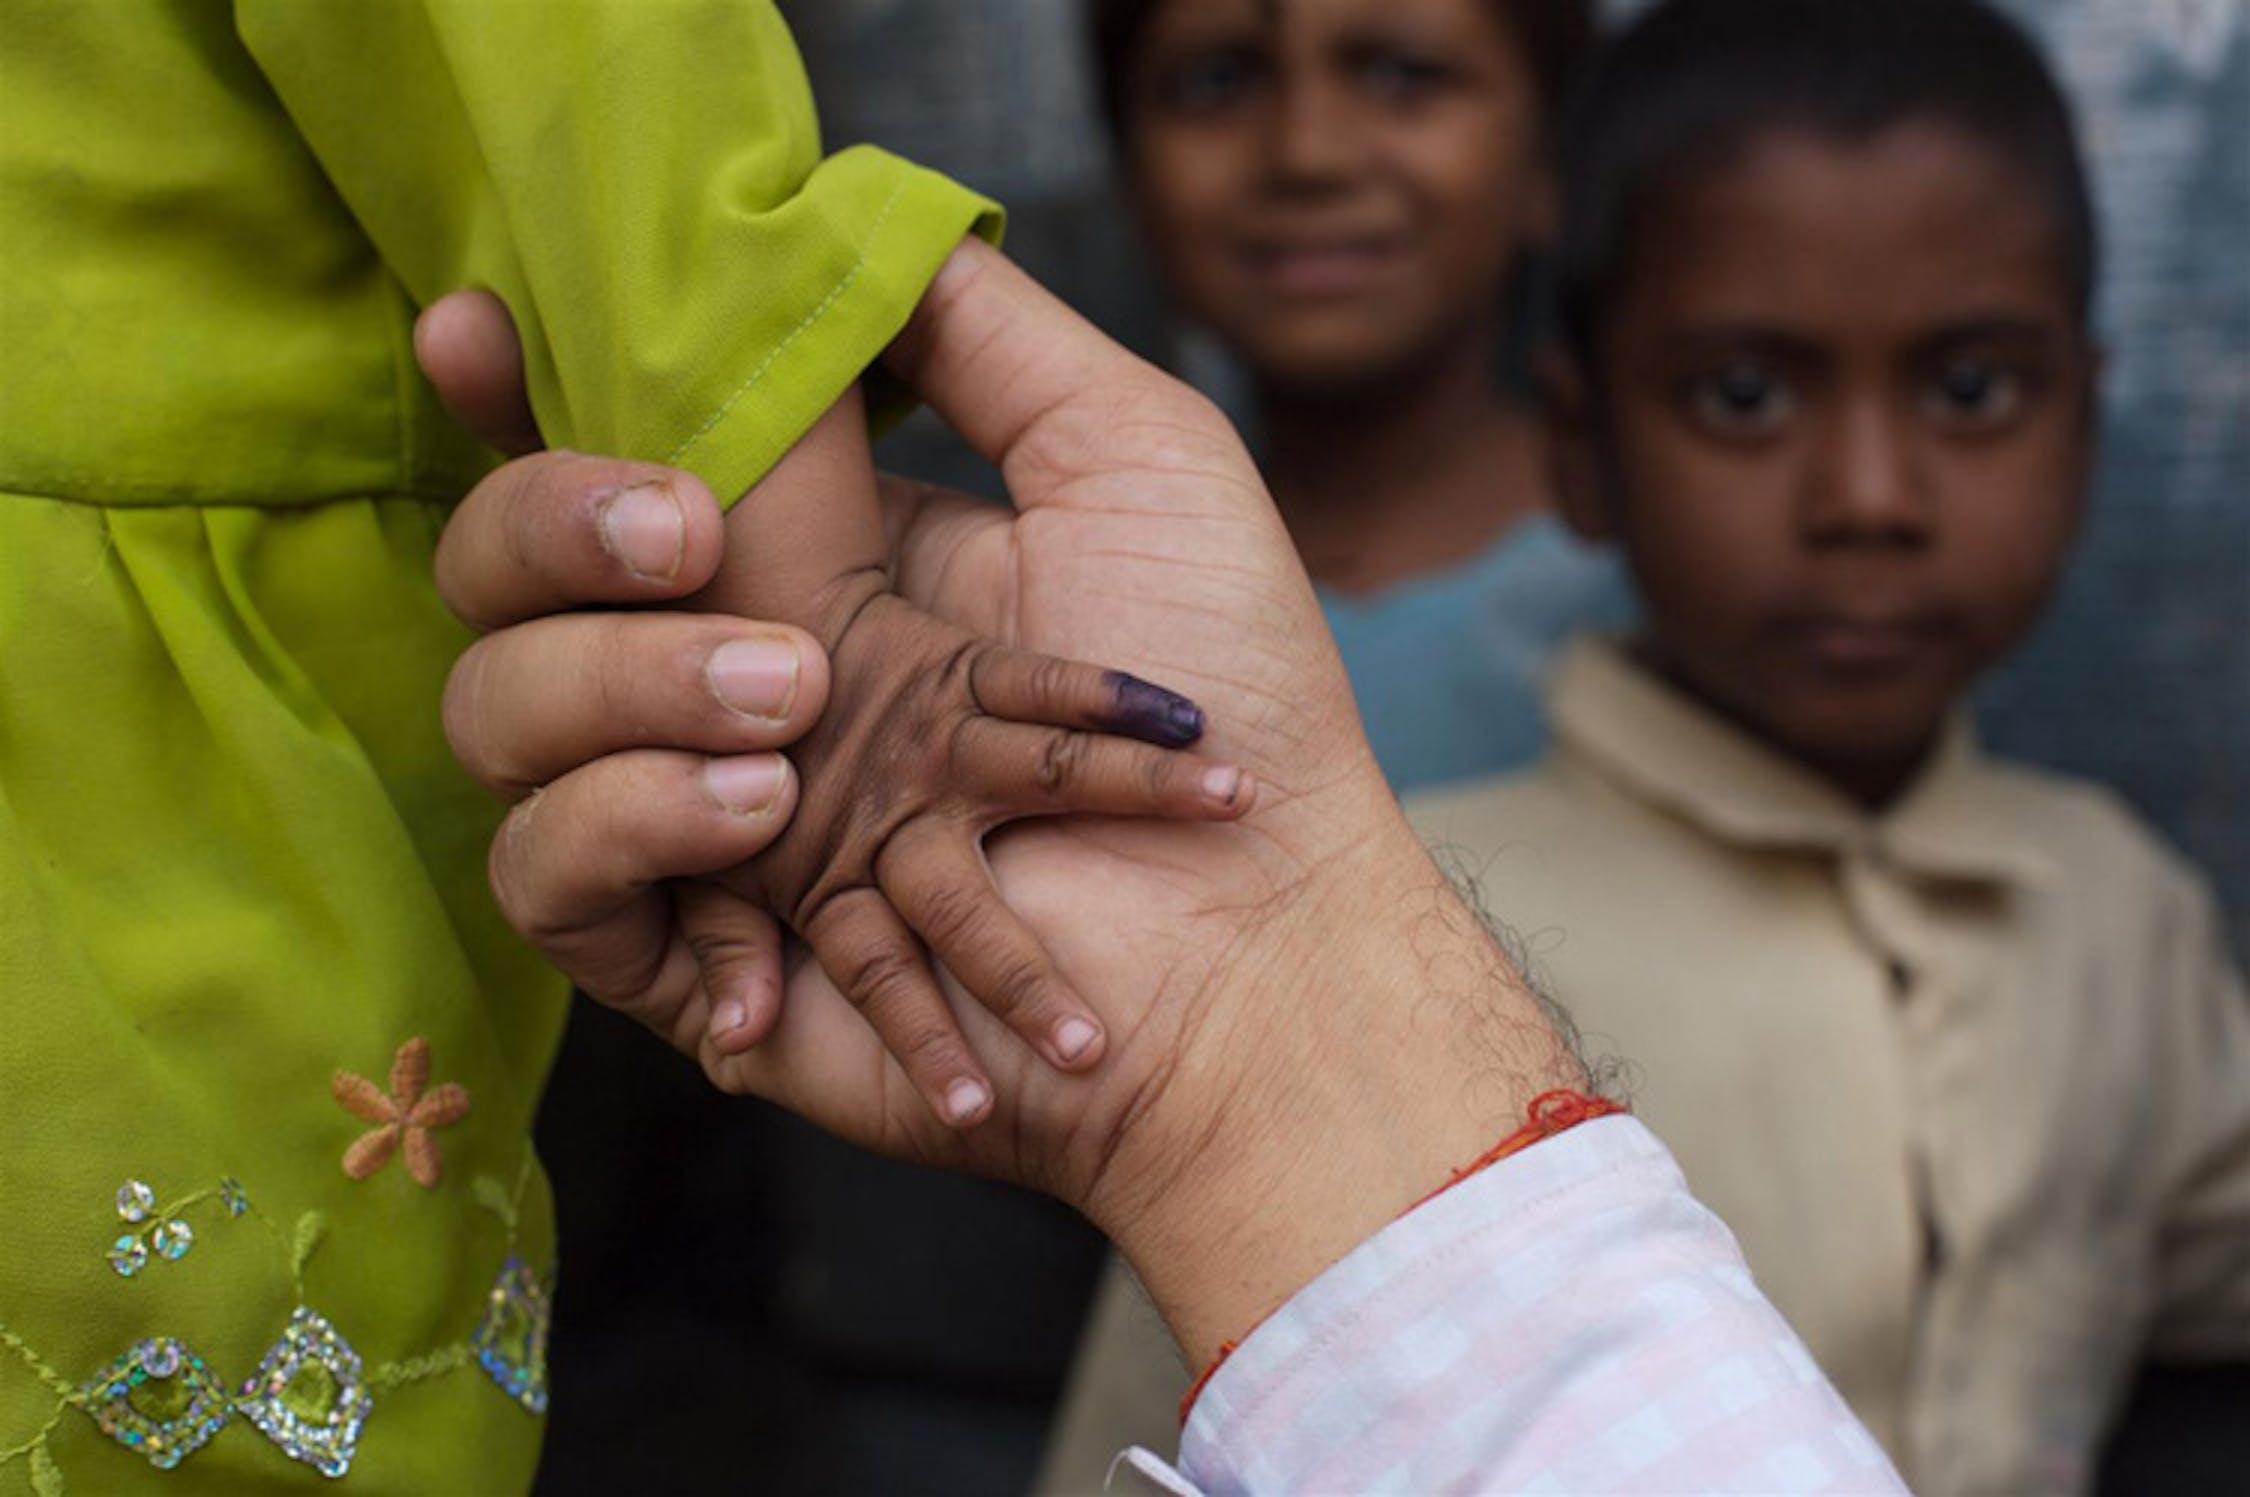 India - ©UNICEF/NYHQ2006-2649/Pietrasik